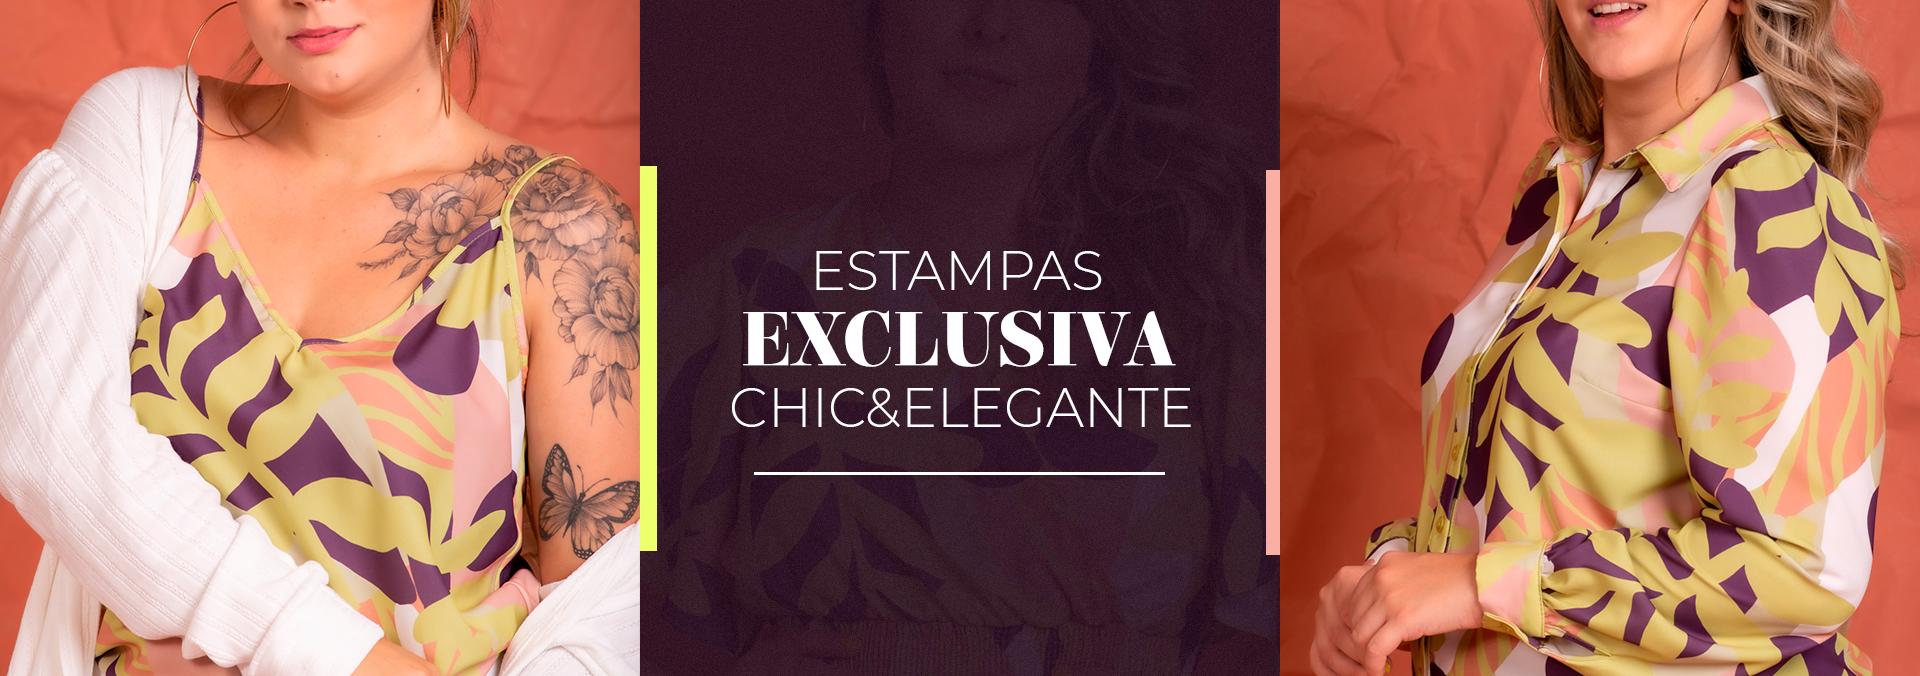 Banner Estampa Exclusiva